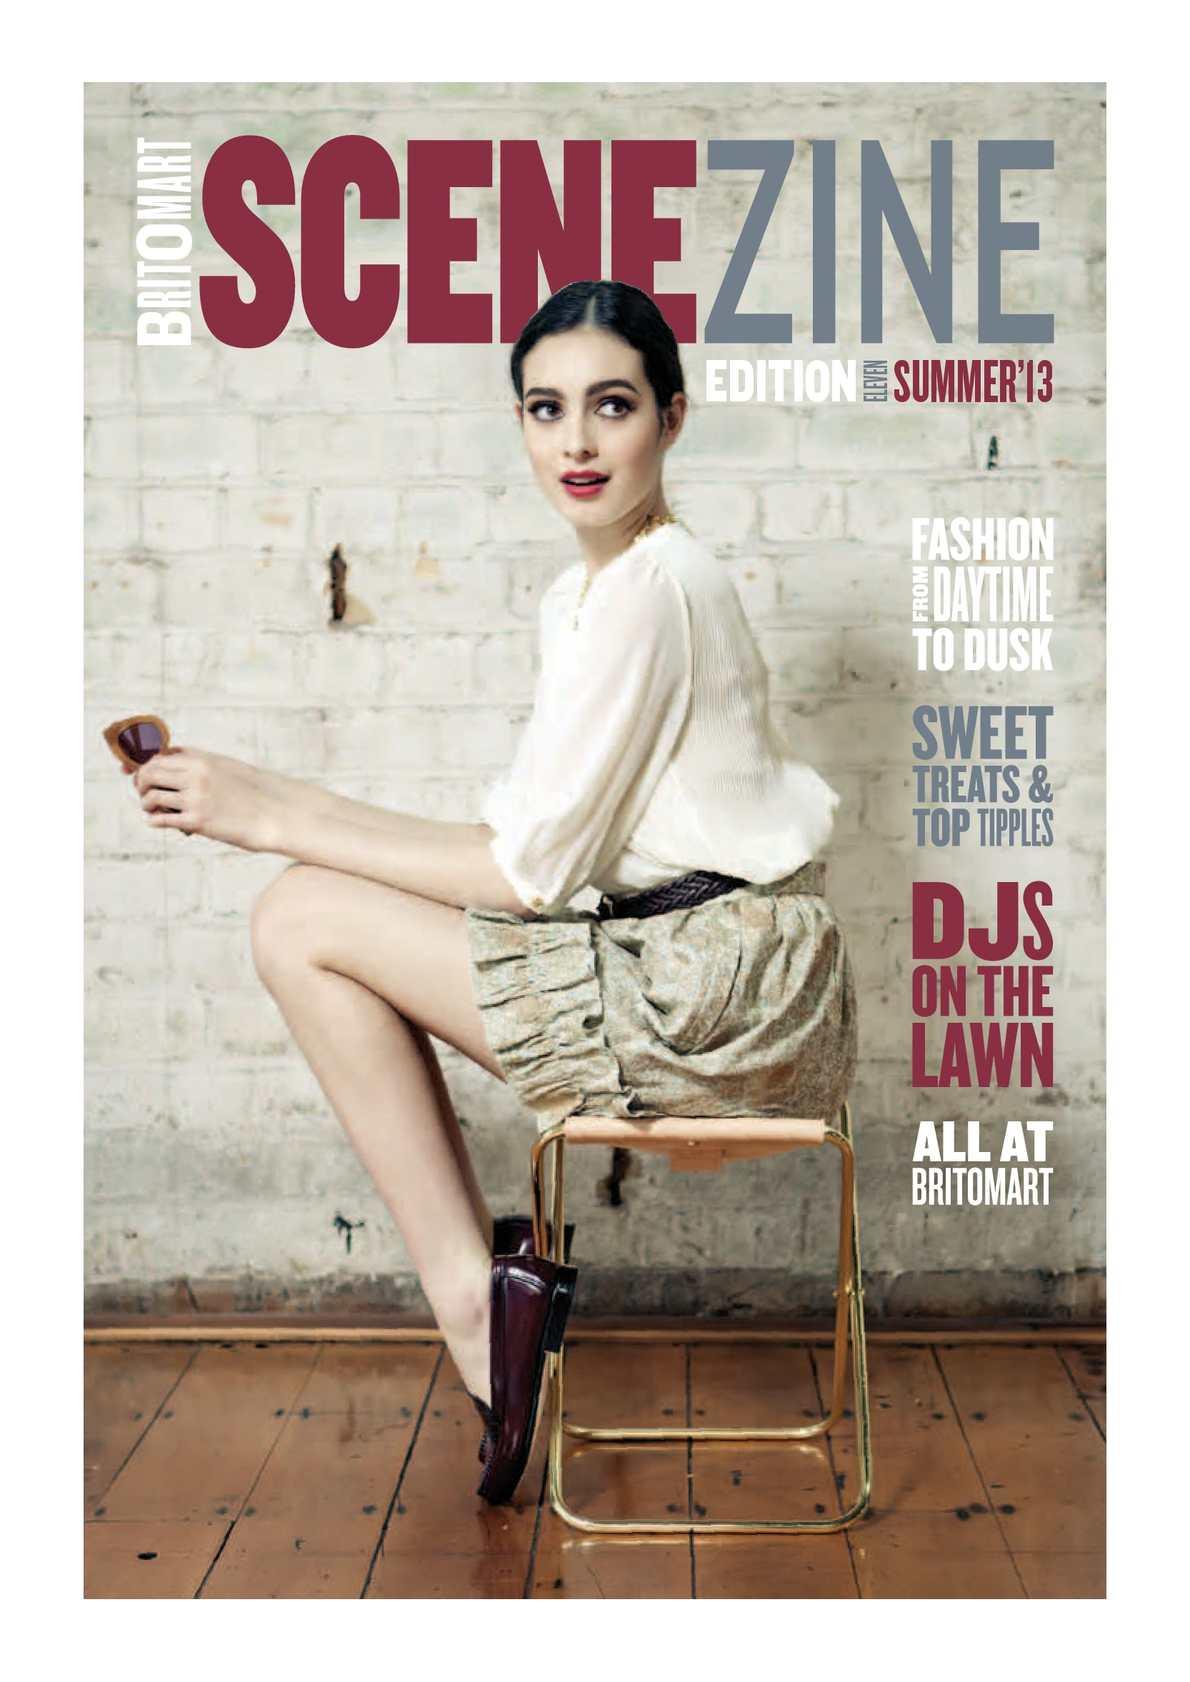 669eeecfc6aae Calaméo - Britomart Scenezine Edition 11